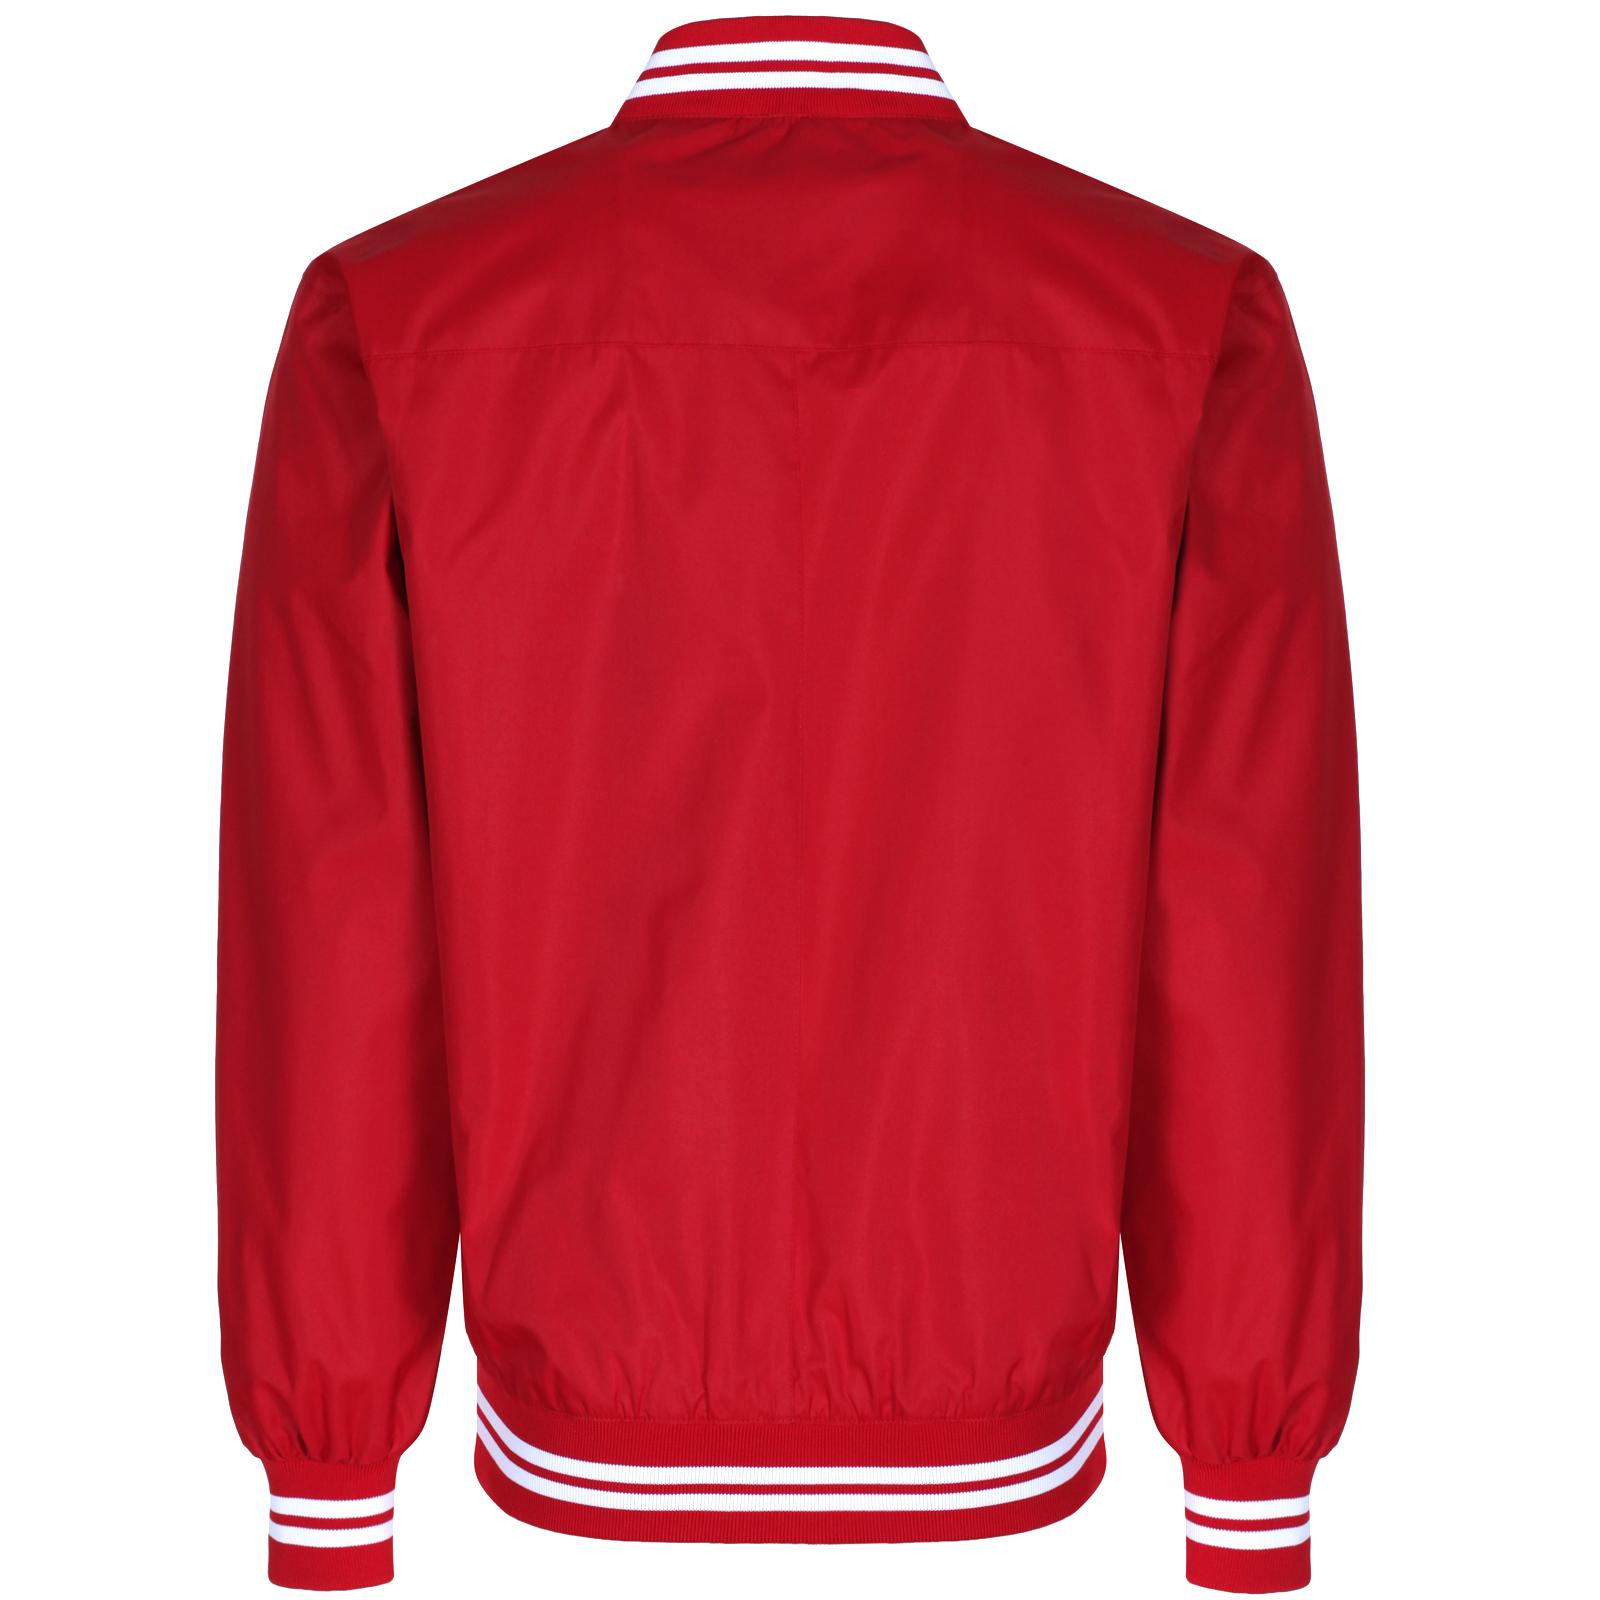 Soul Star Mens Retro Bomber Jacket Varsity College Coat Track Top ...